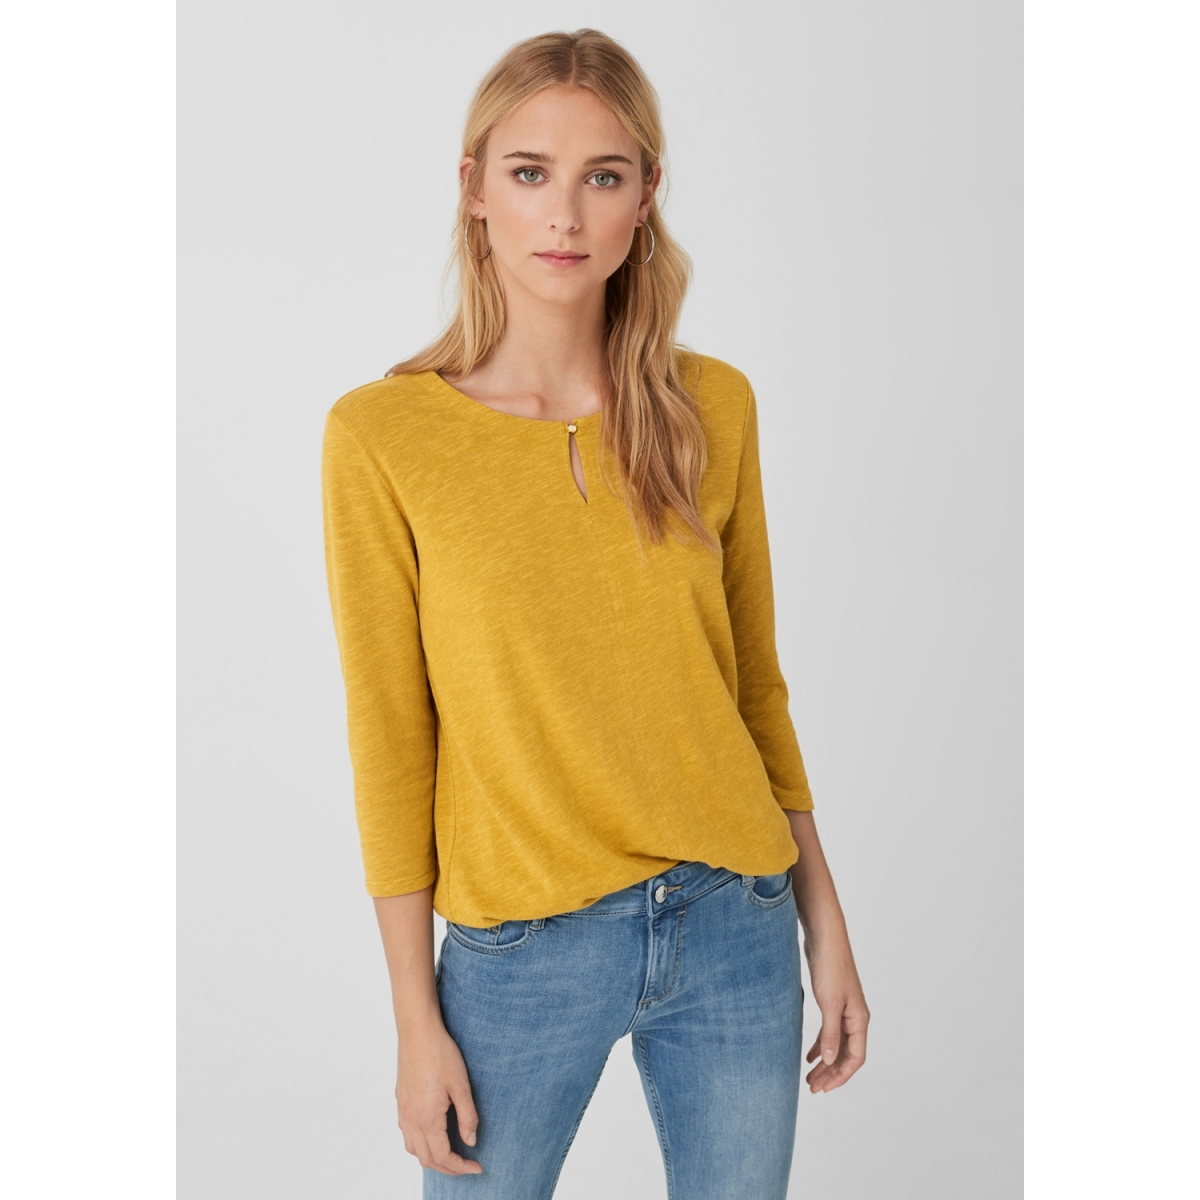 t shirt met driekwart mouw 14909392691 s.oliver t-shirt 1543